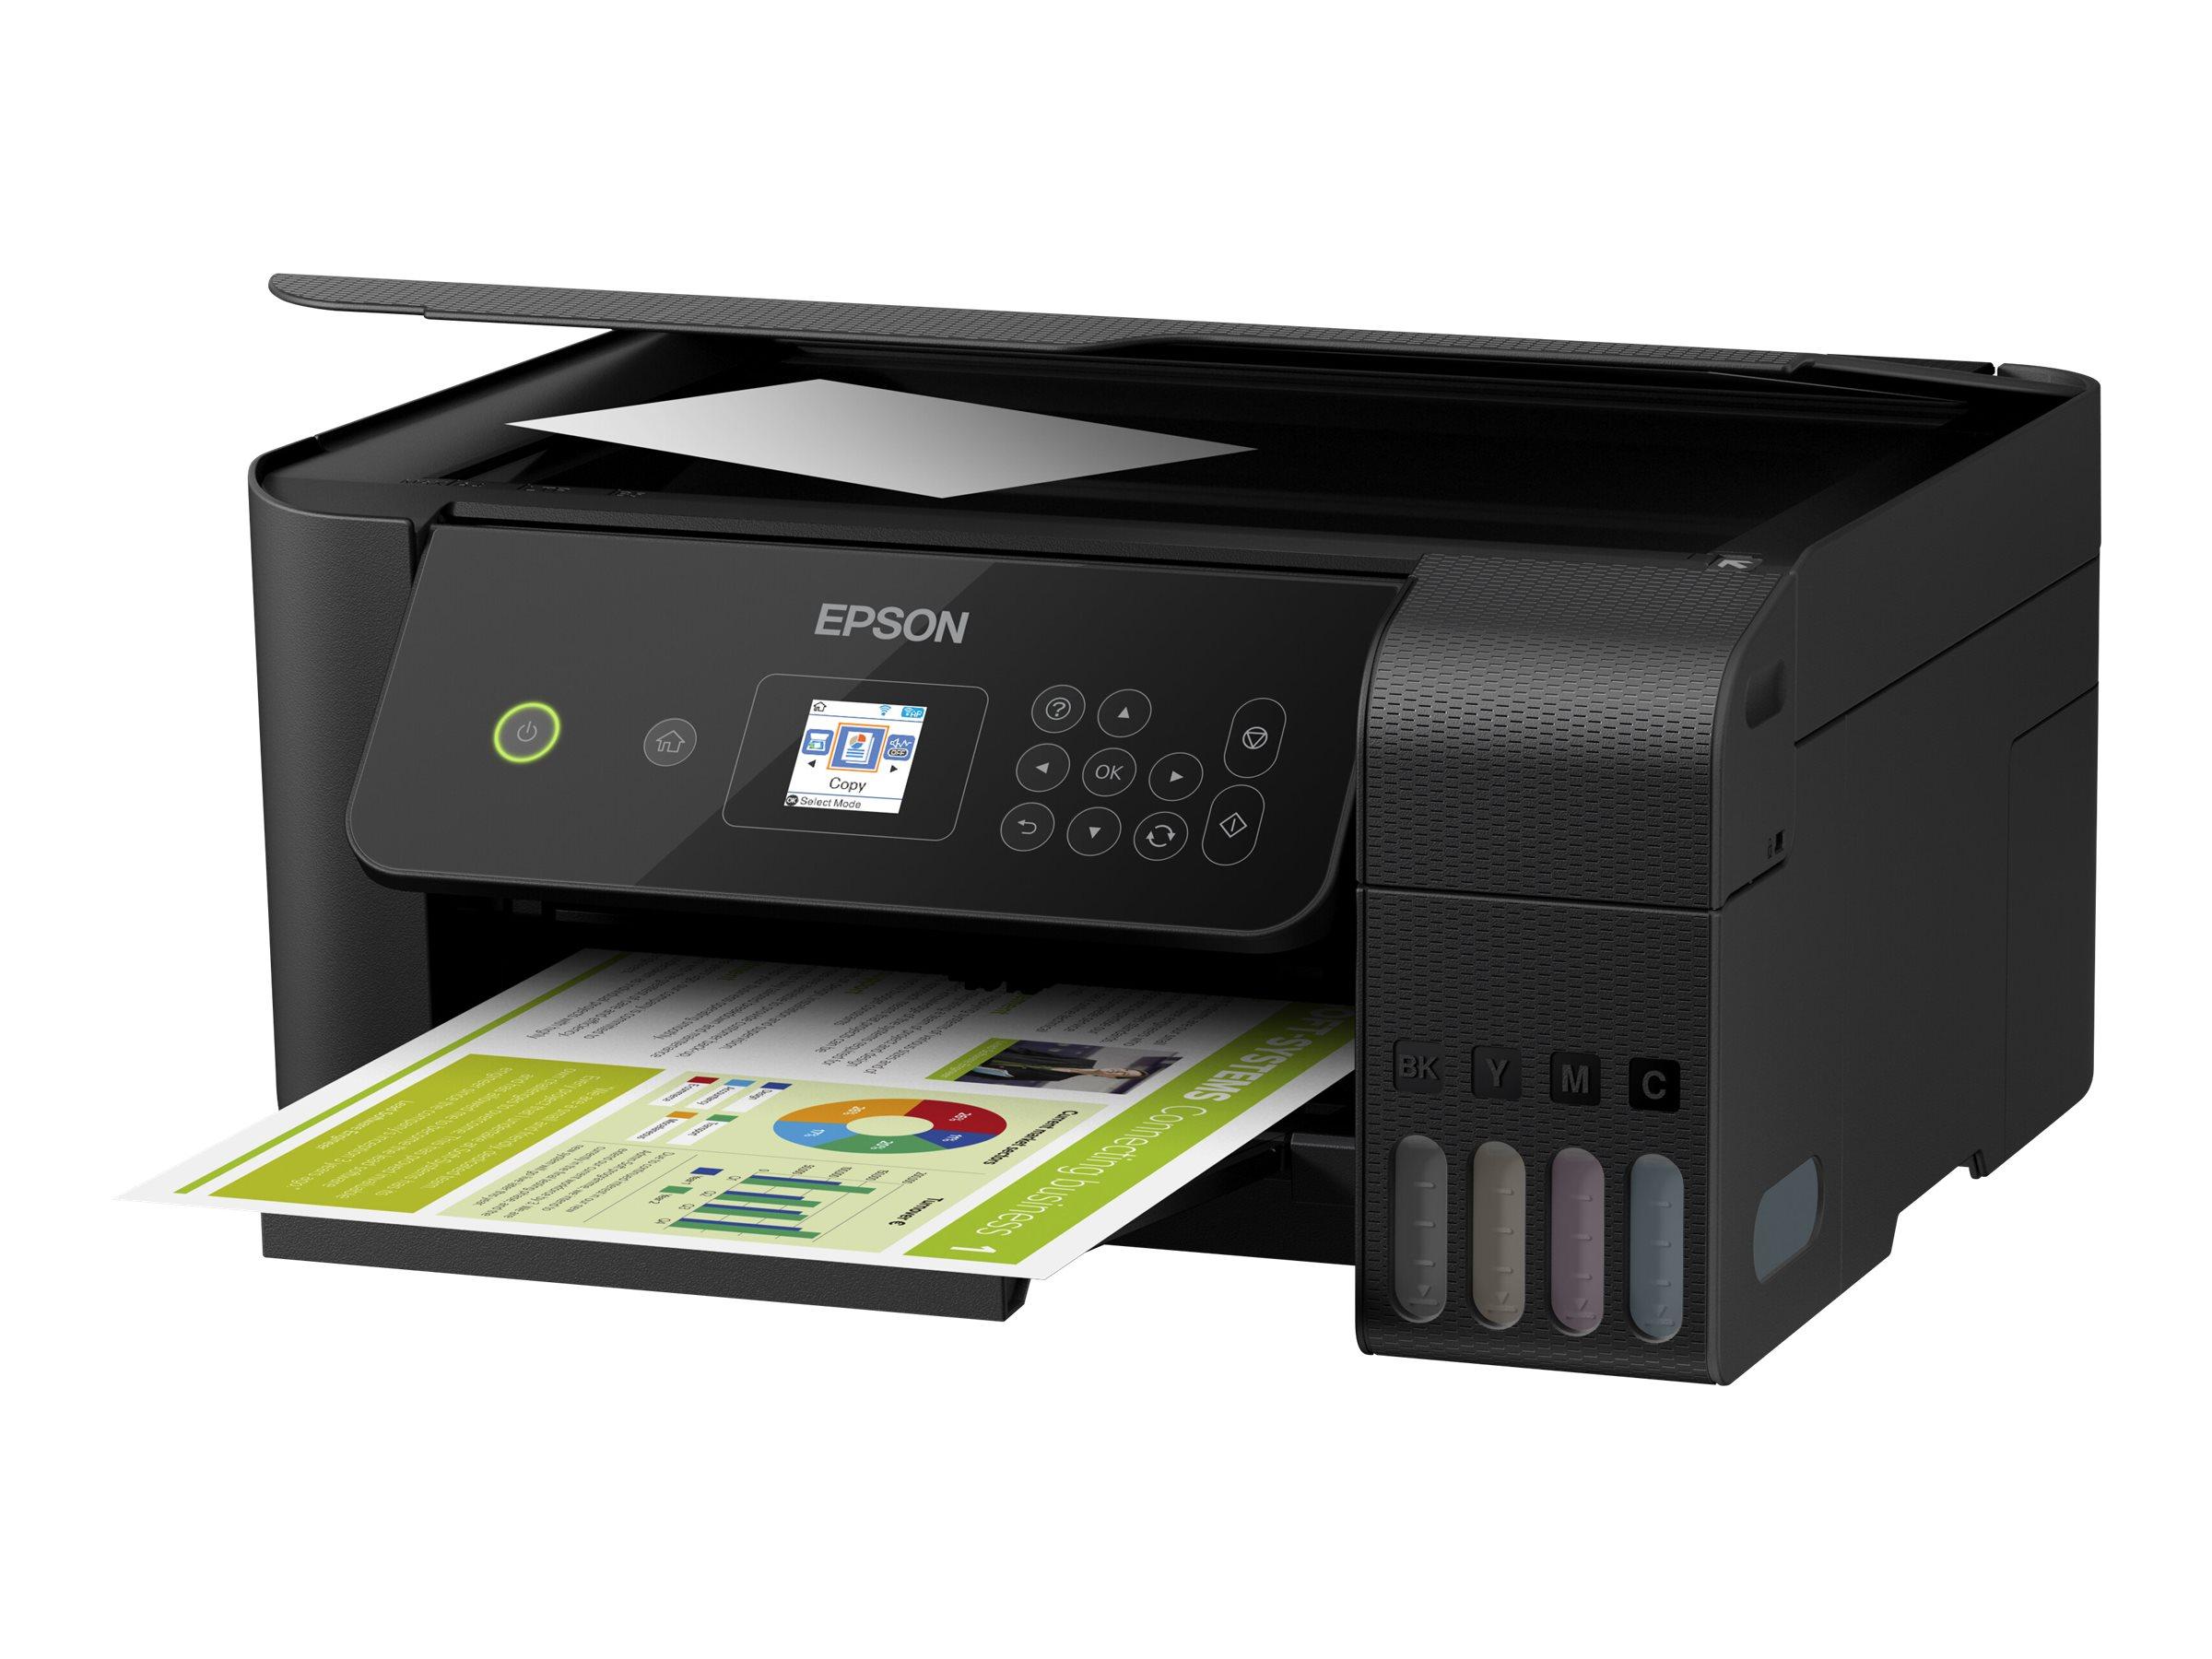 Epson EcoTank ET-2720 Unlimited - Multifunktionsdrucker - Farbe - Tintenstrahl - refillable - A4/Legal (Medien)